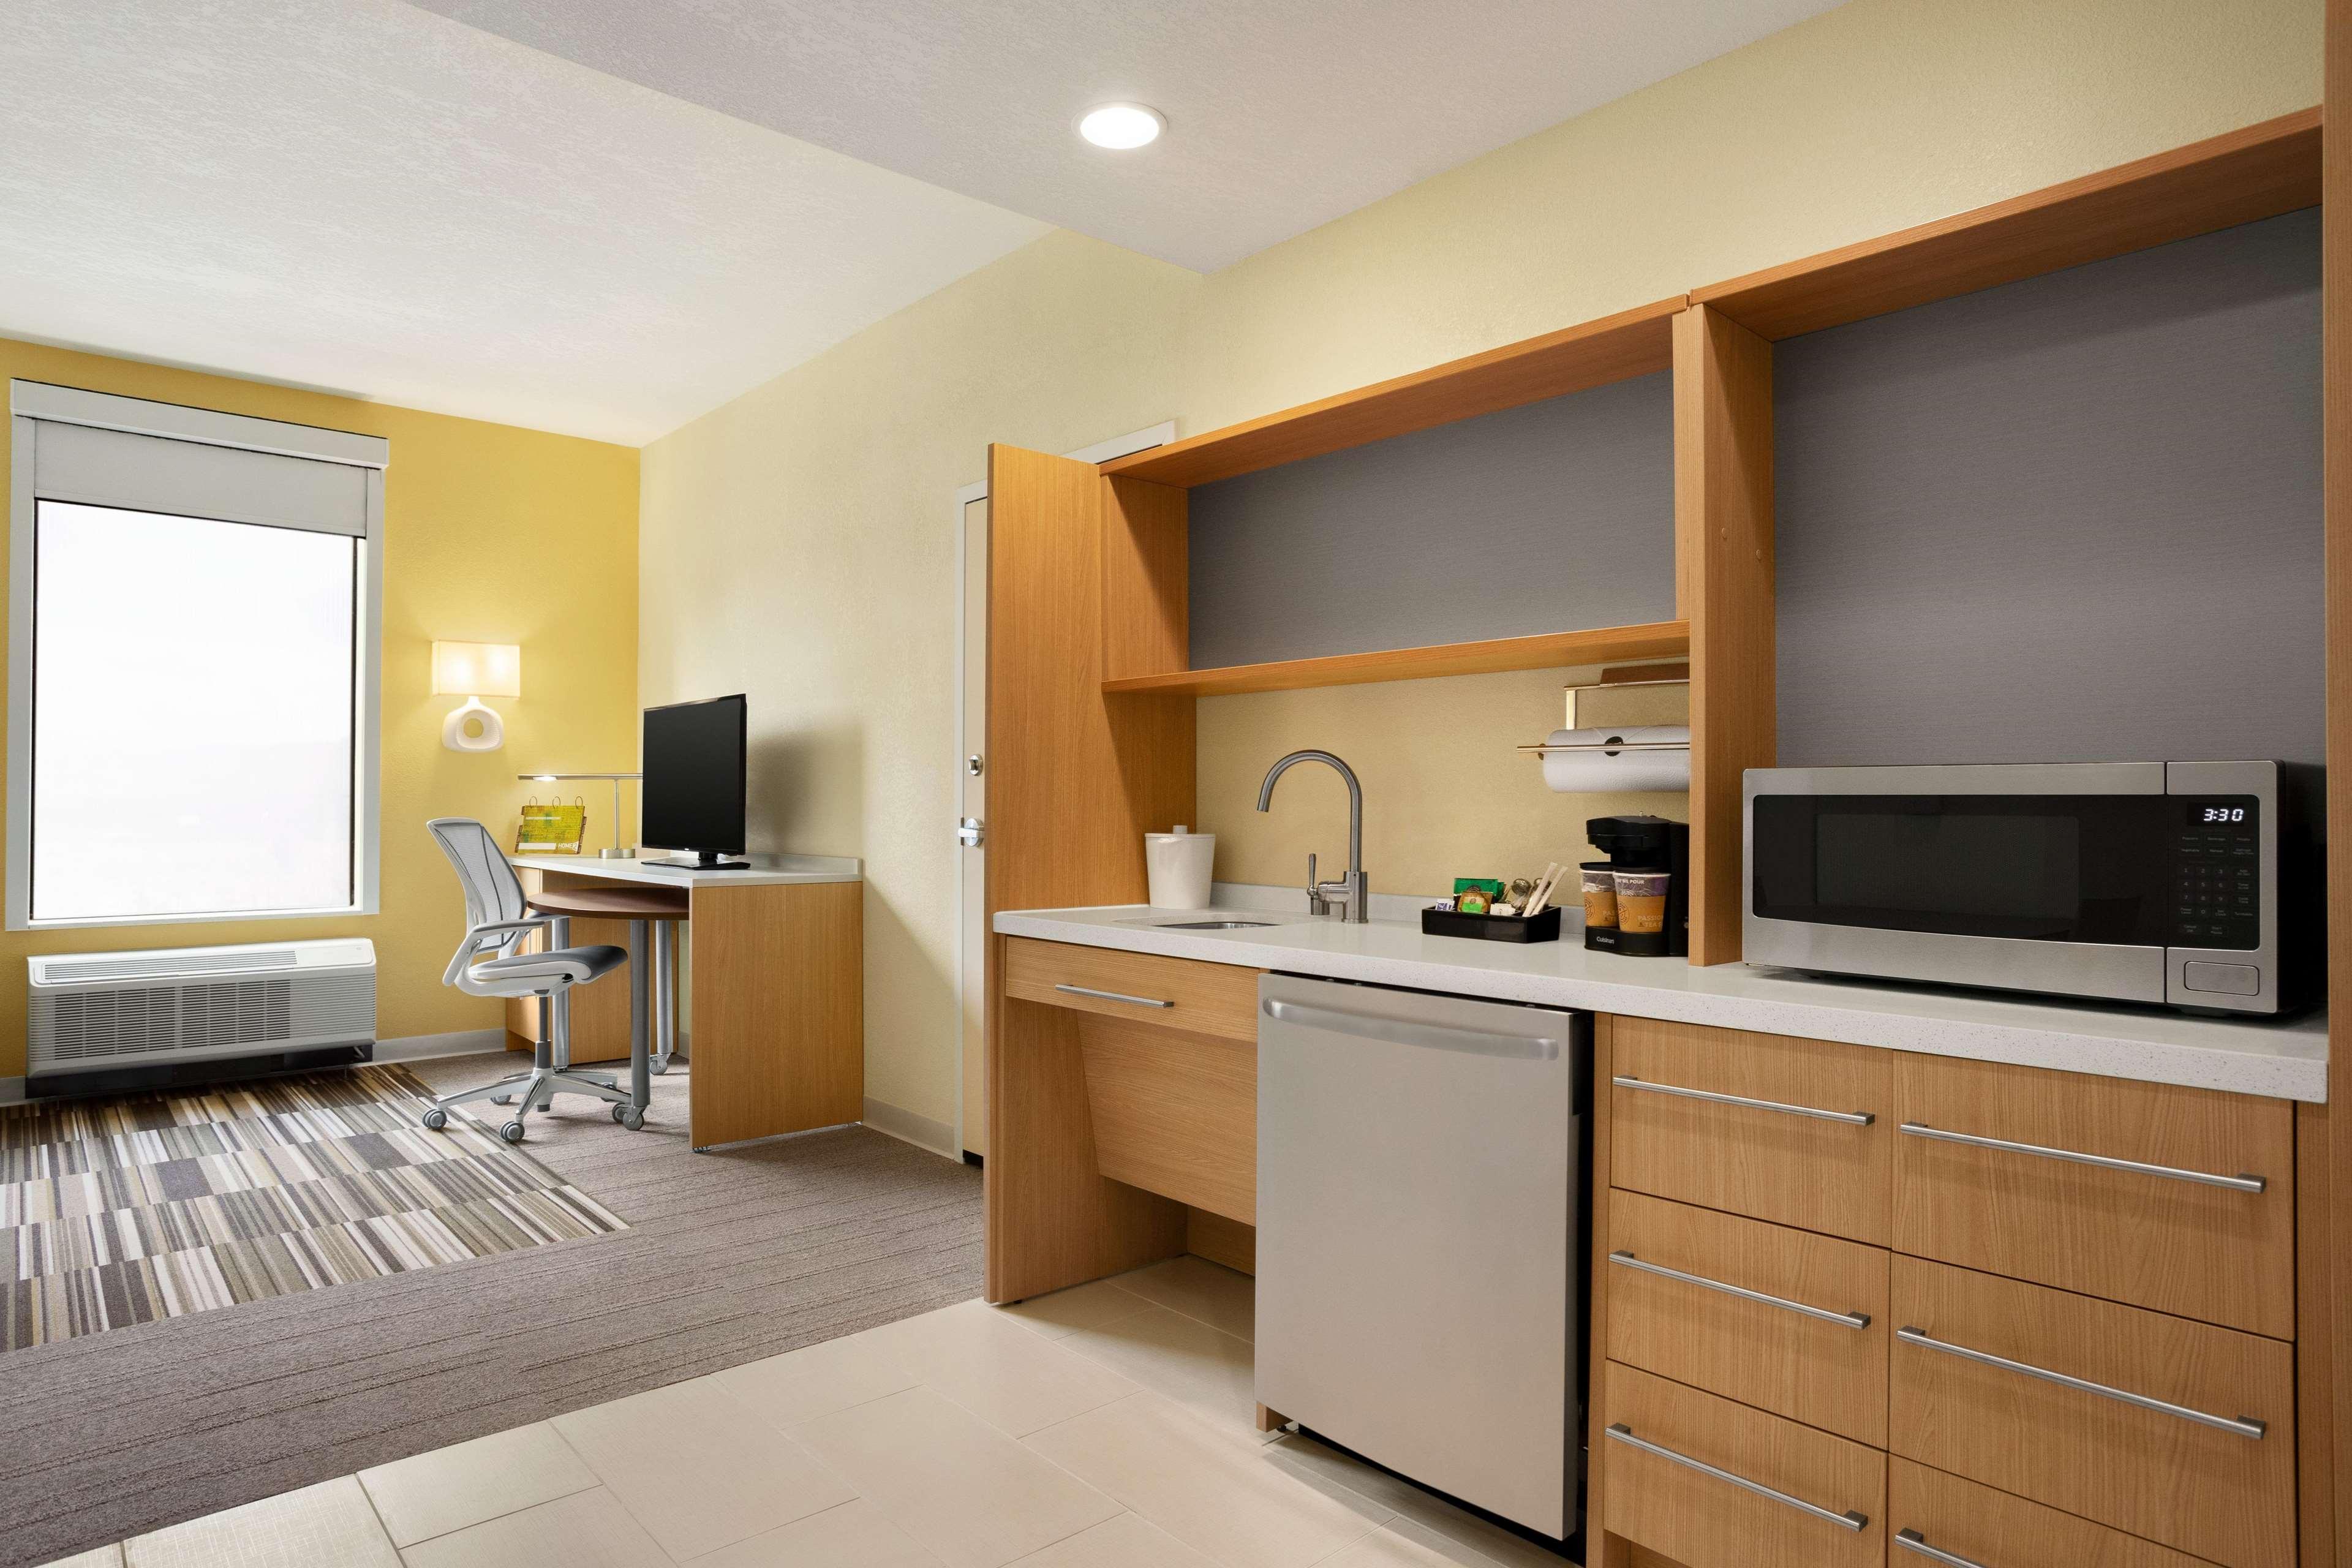 Home2 Suites by Hilton Elko image 29